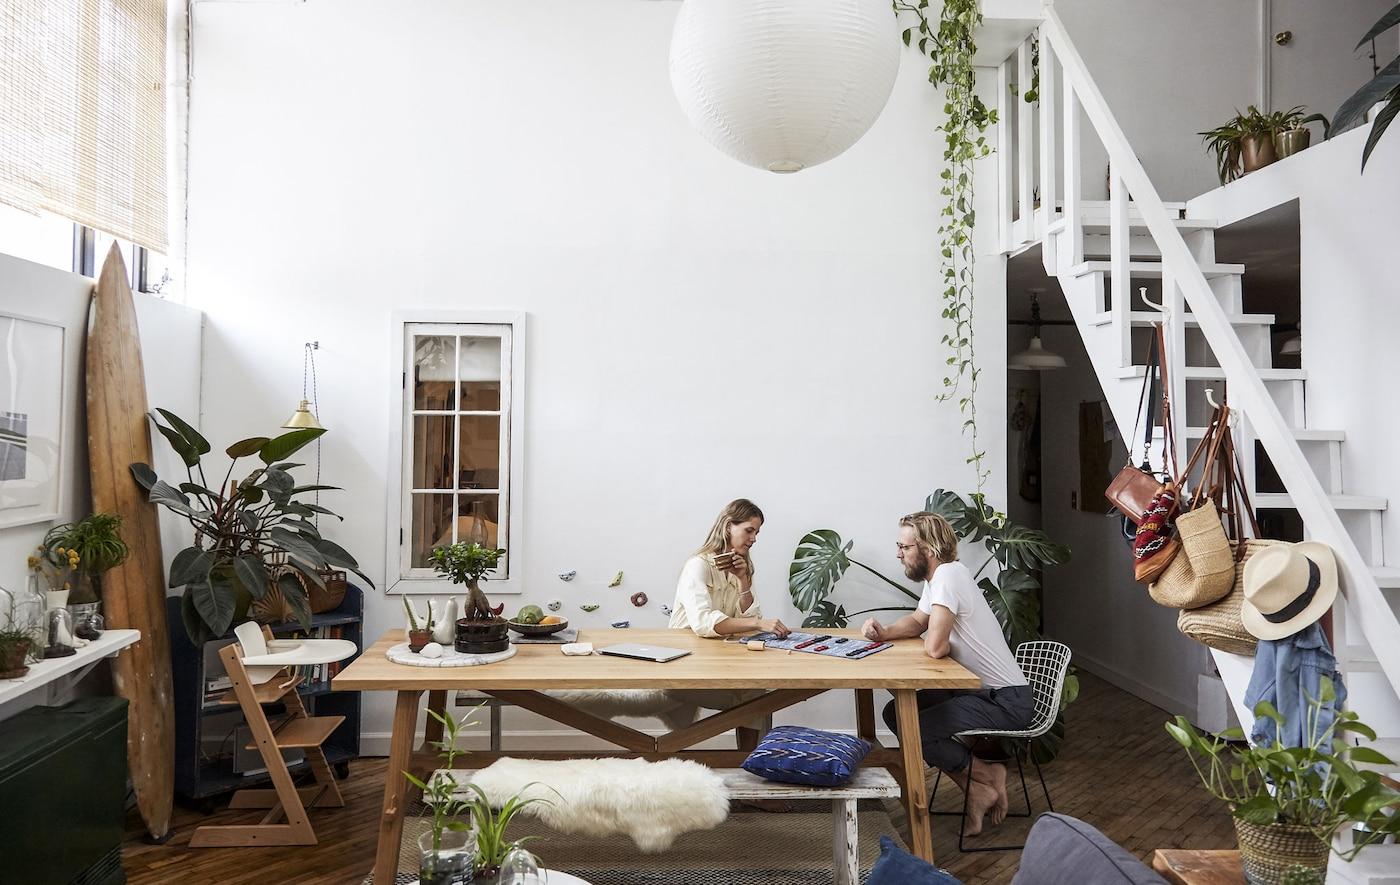 Un tavolo multifunzionale è una soluzione pratica - IKEA.